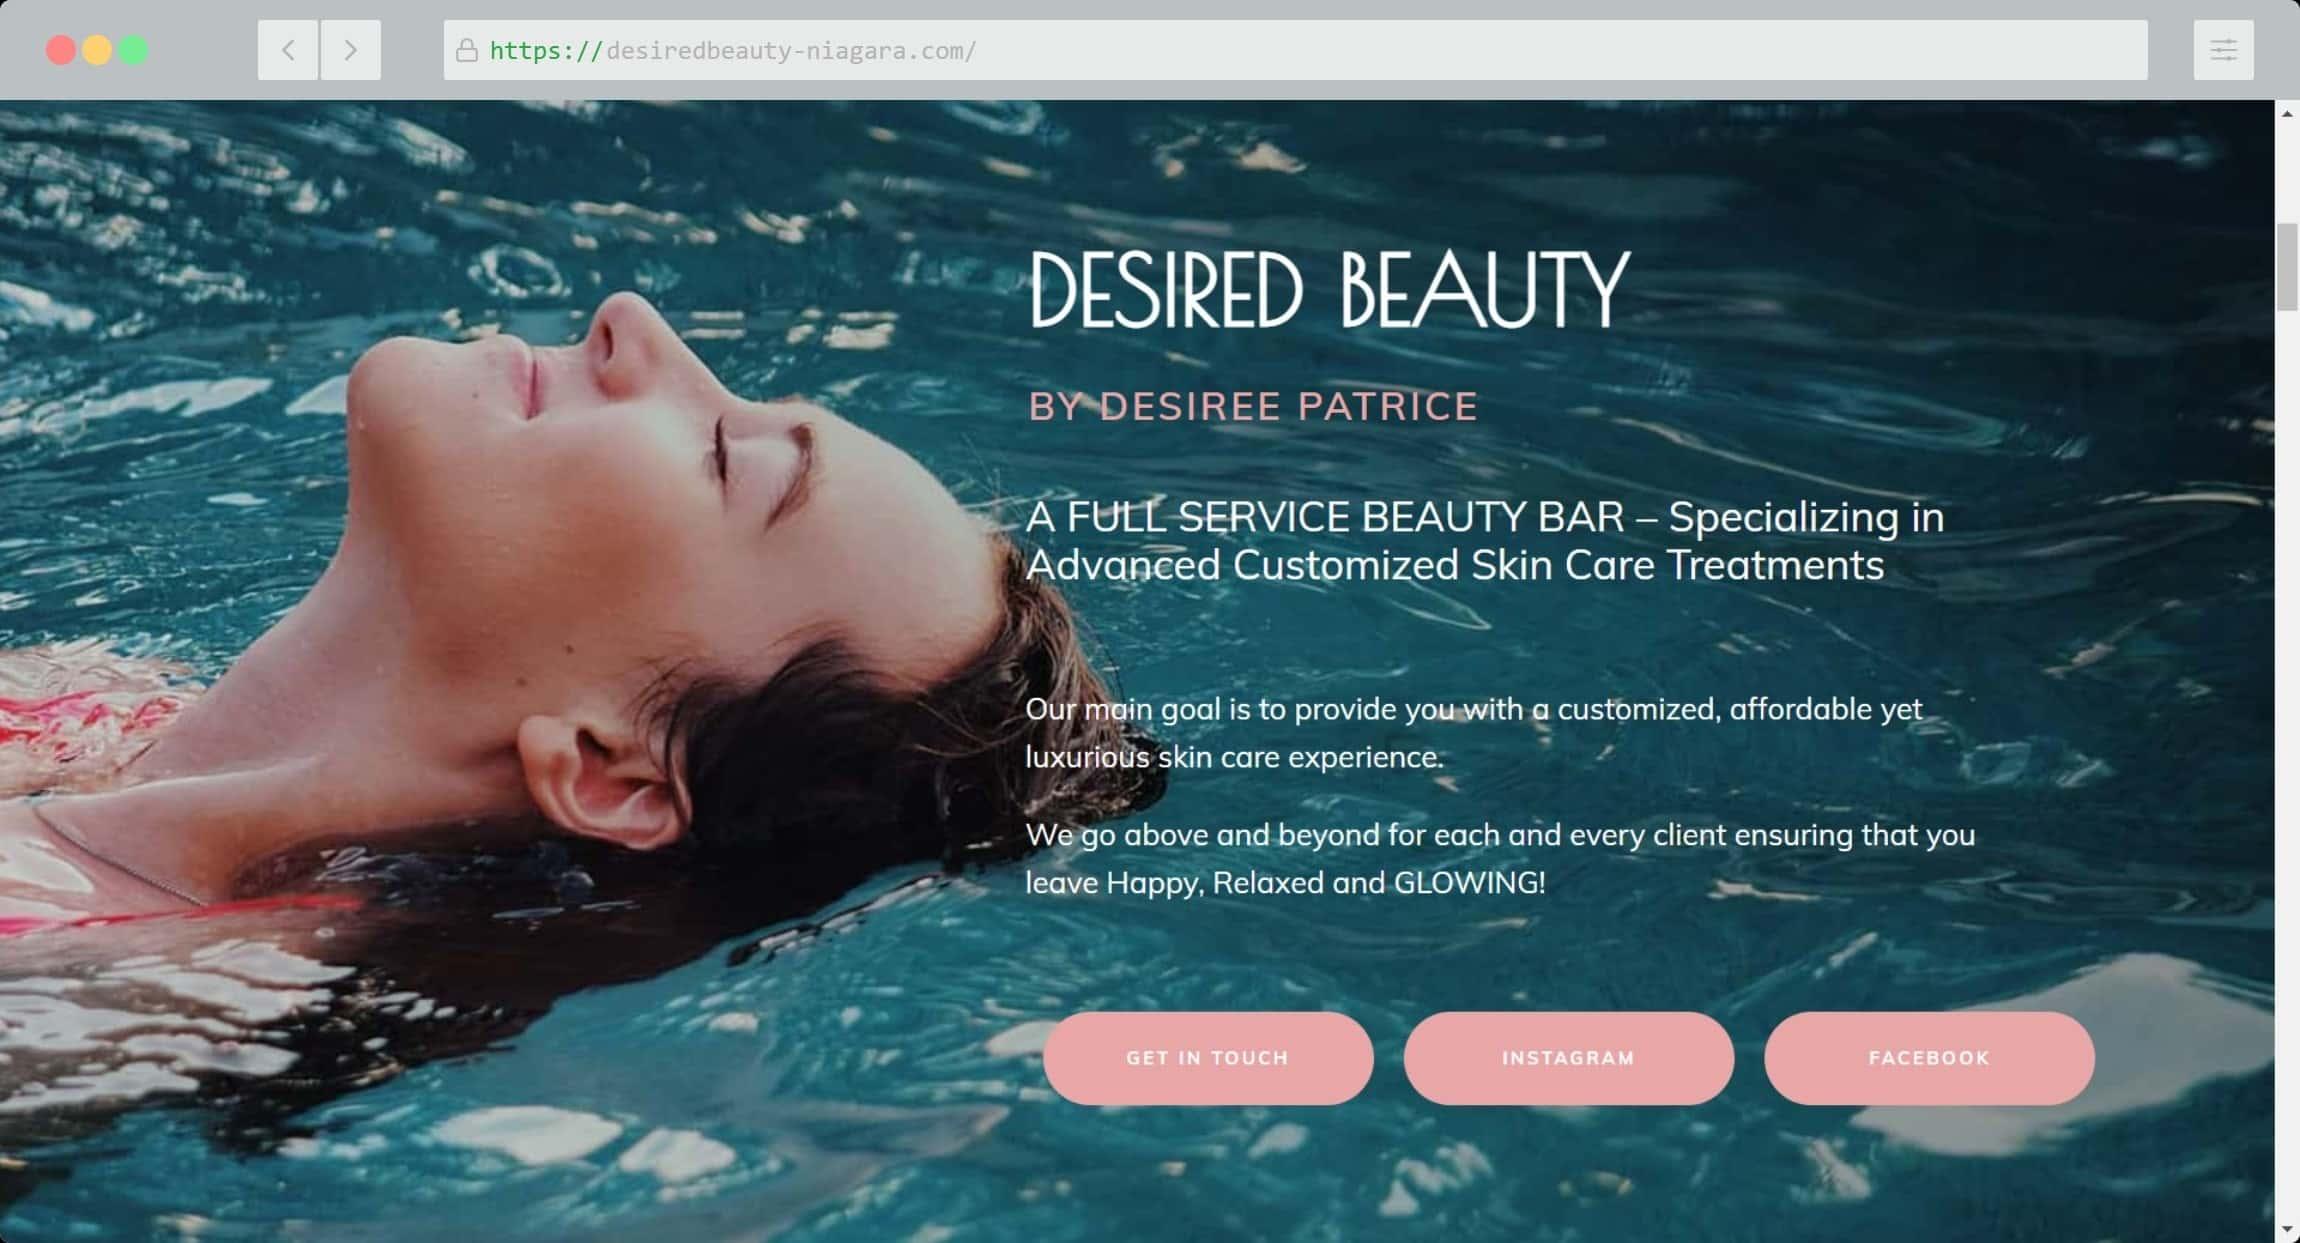 Desired Beauty Niagara Website